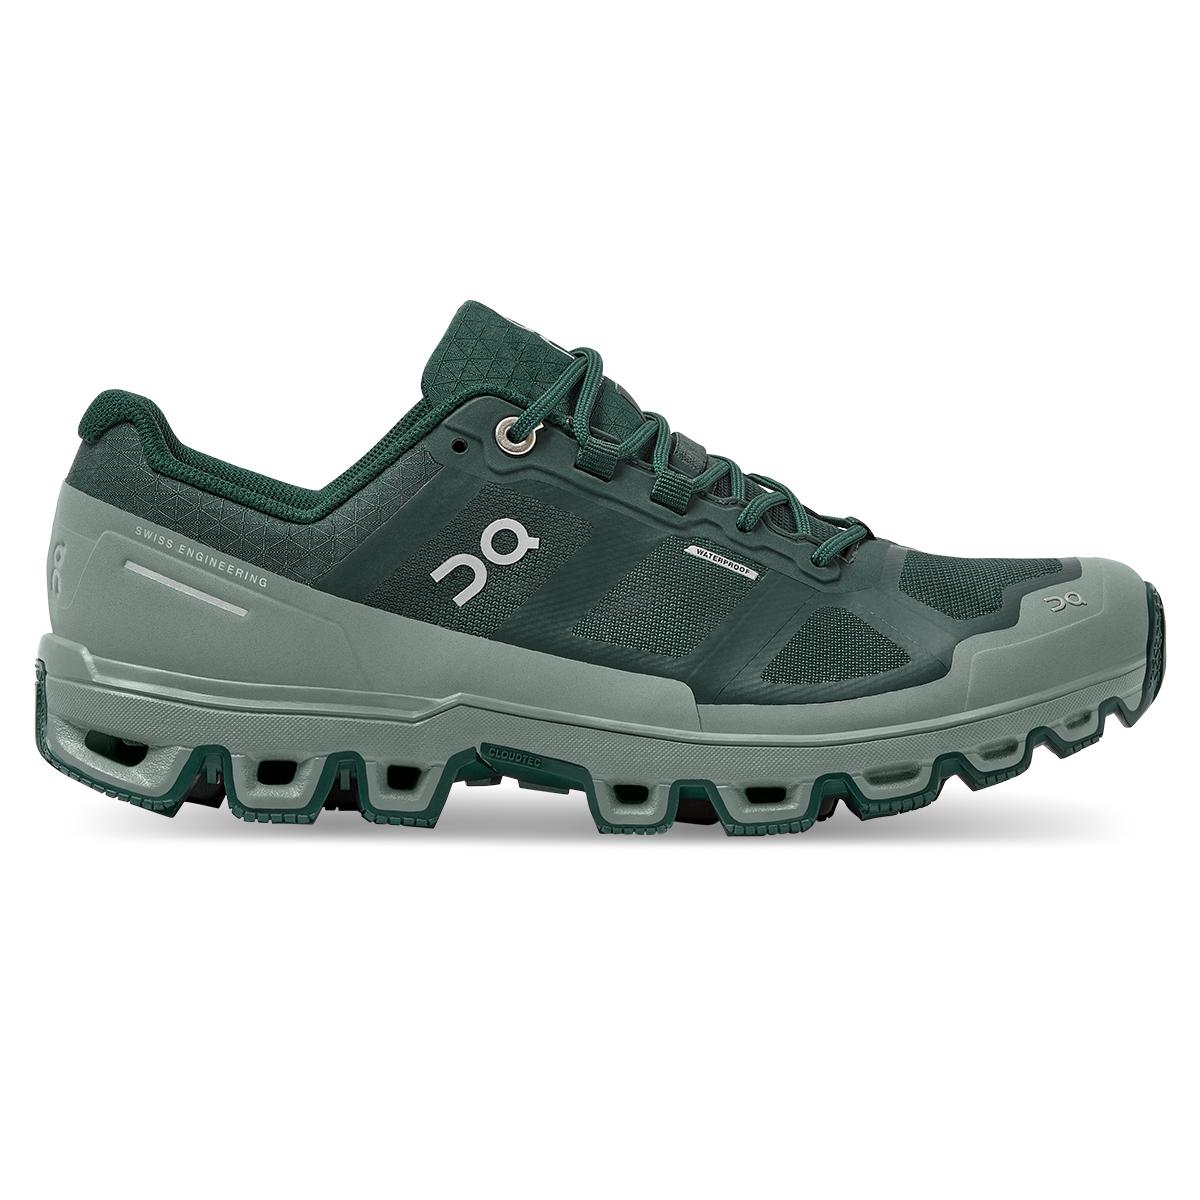 Women's On Cloudventure Waterproof Trail Running Shoe - Color: Juniper/Sea - Size: 5 - Width: Regular, Juniper/Sea, large, image 1